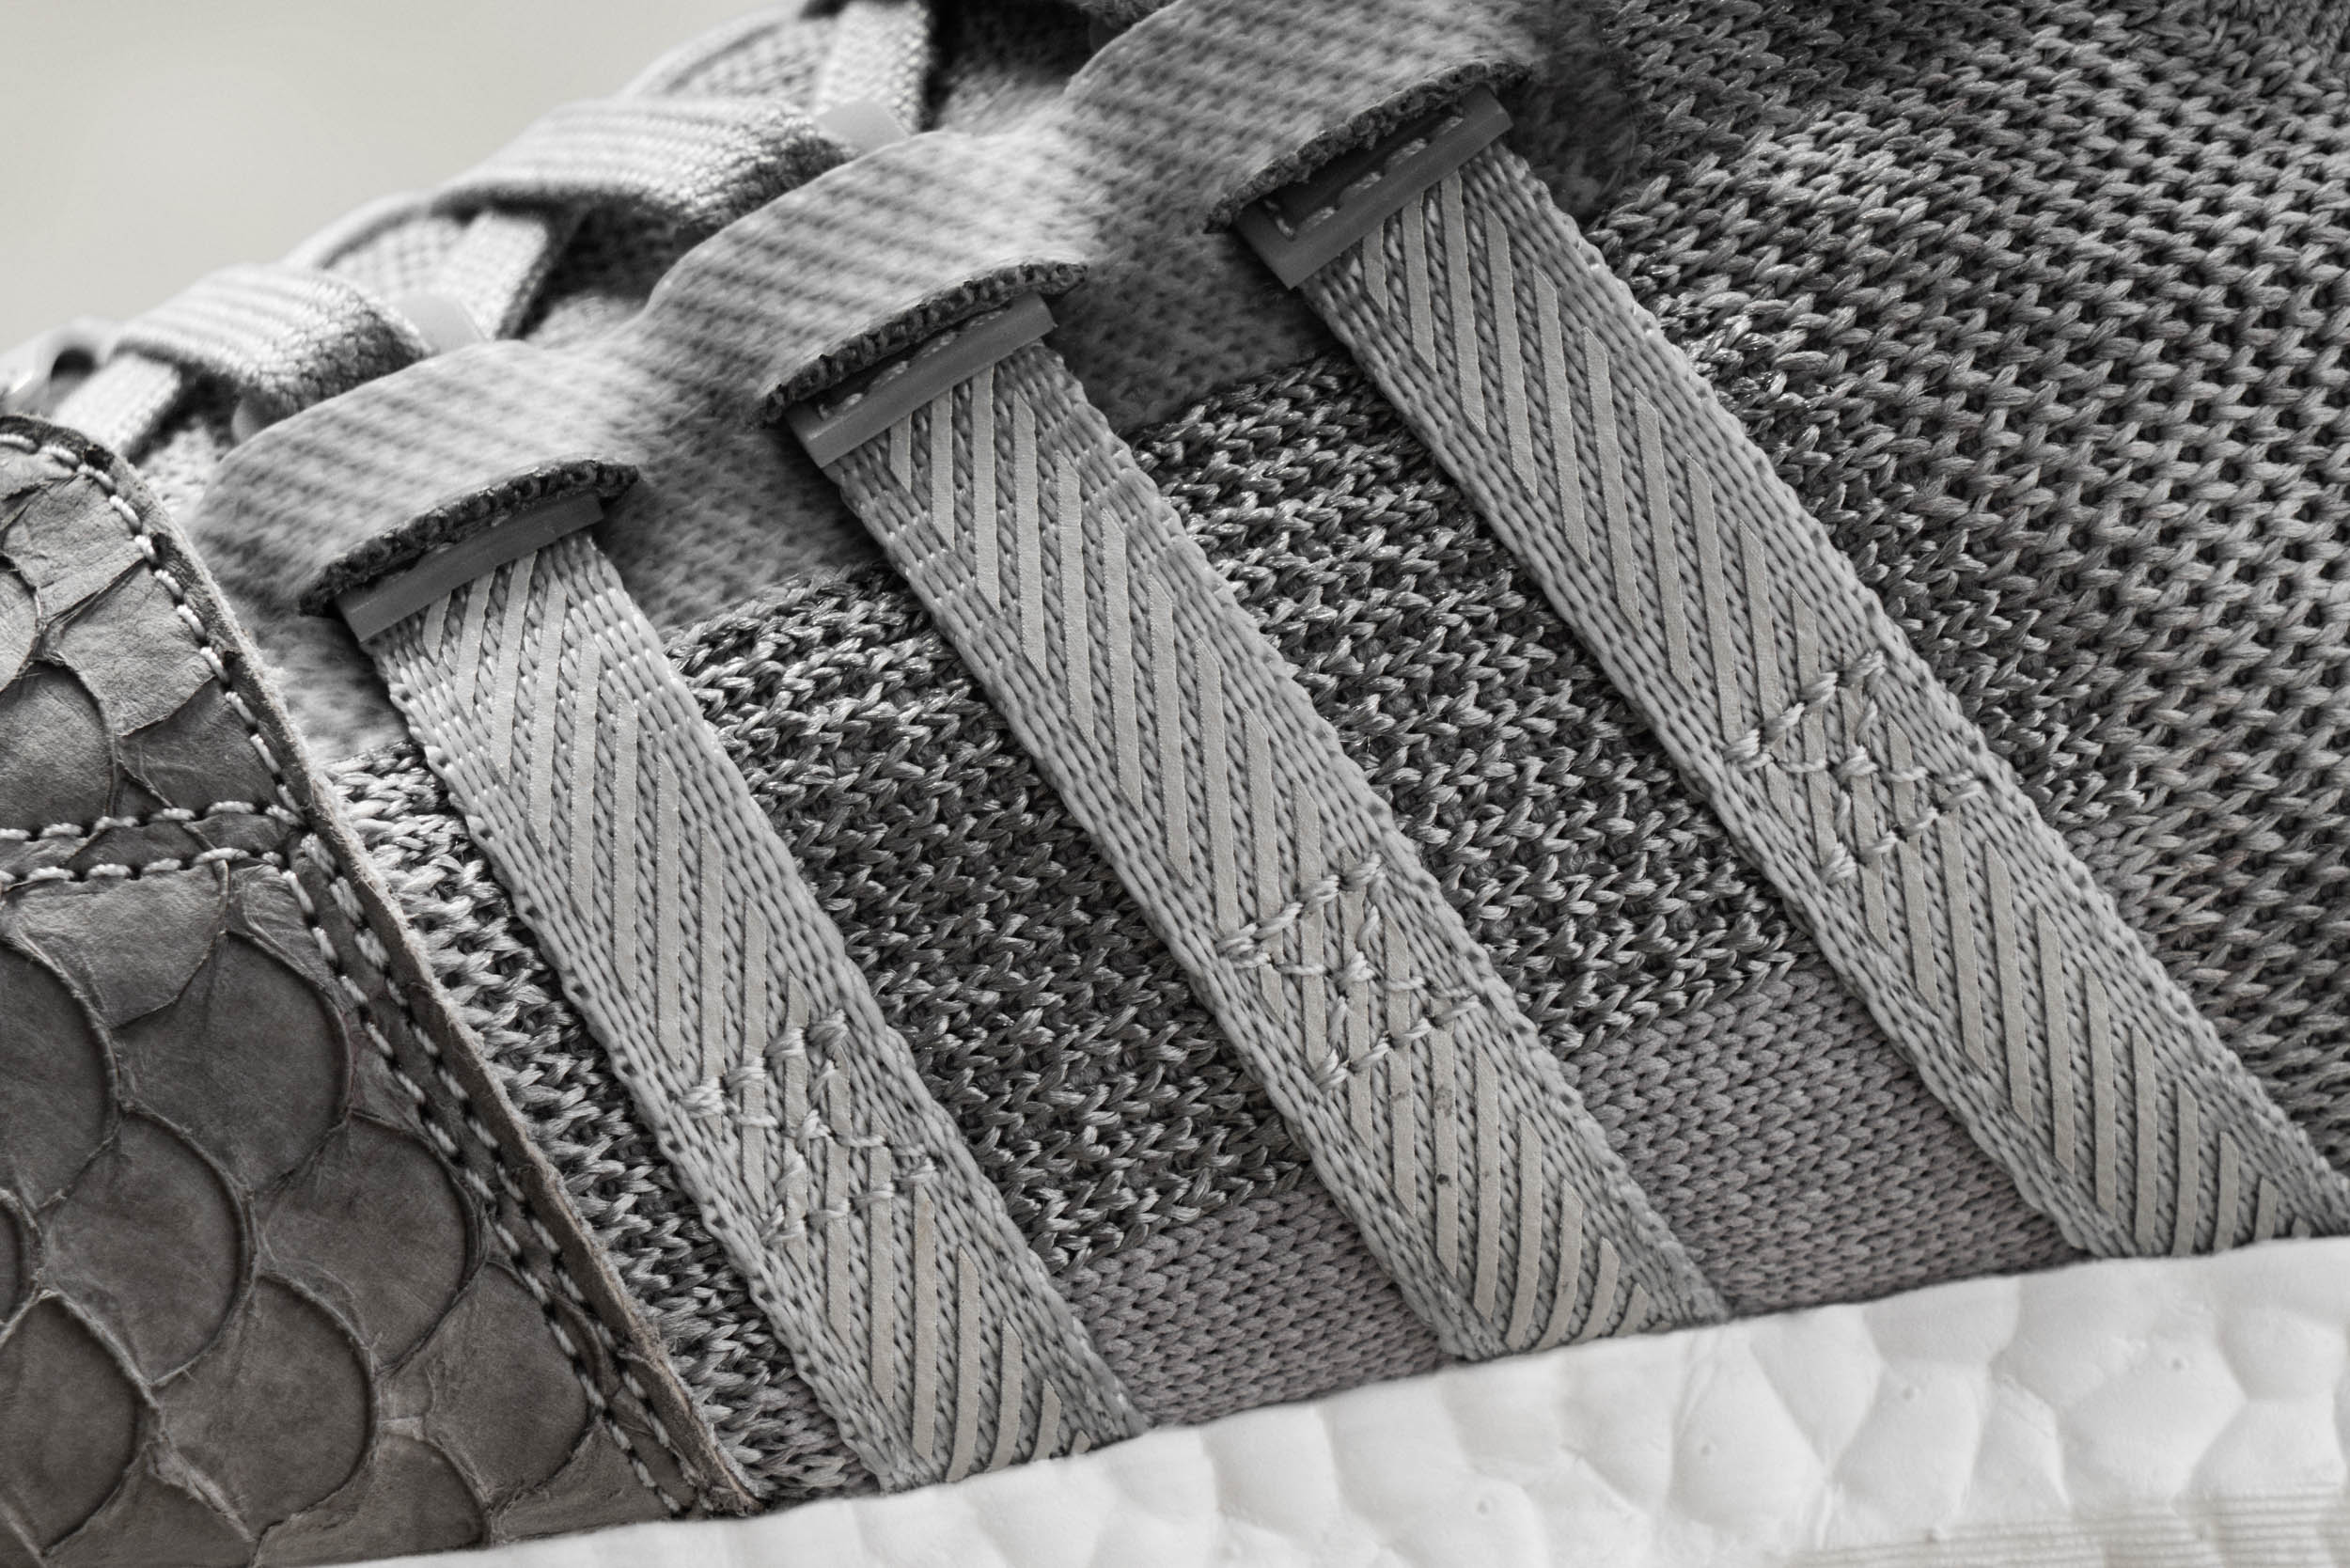 chaussure-pusha-t-x-adidas-equipment-91-16-boost-primeknit-king-push-7